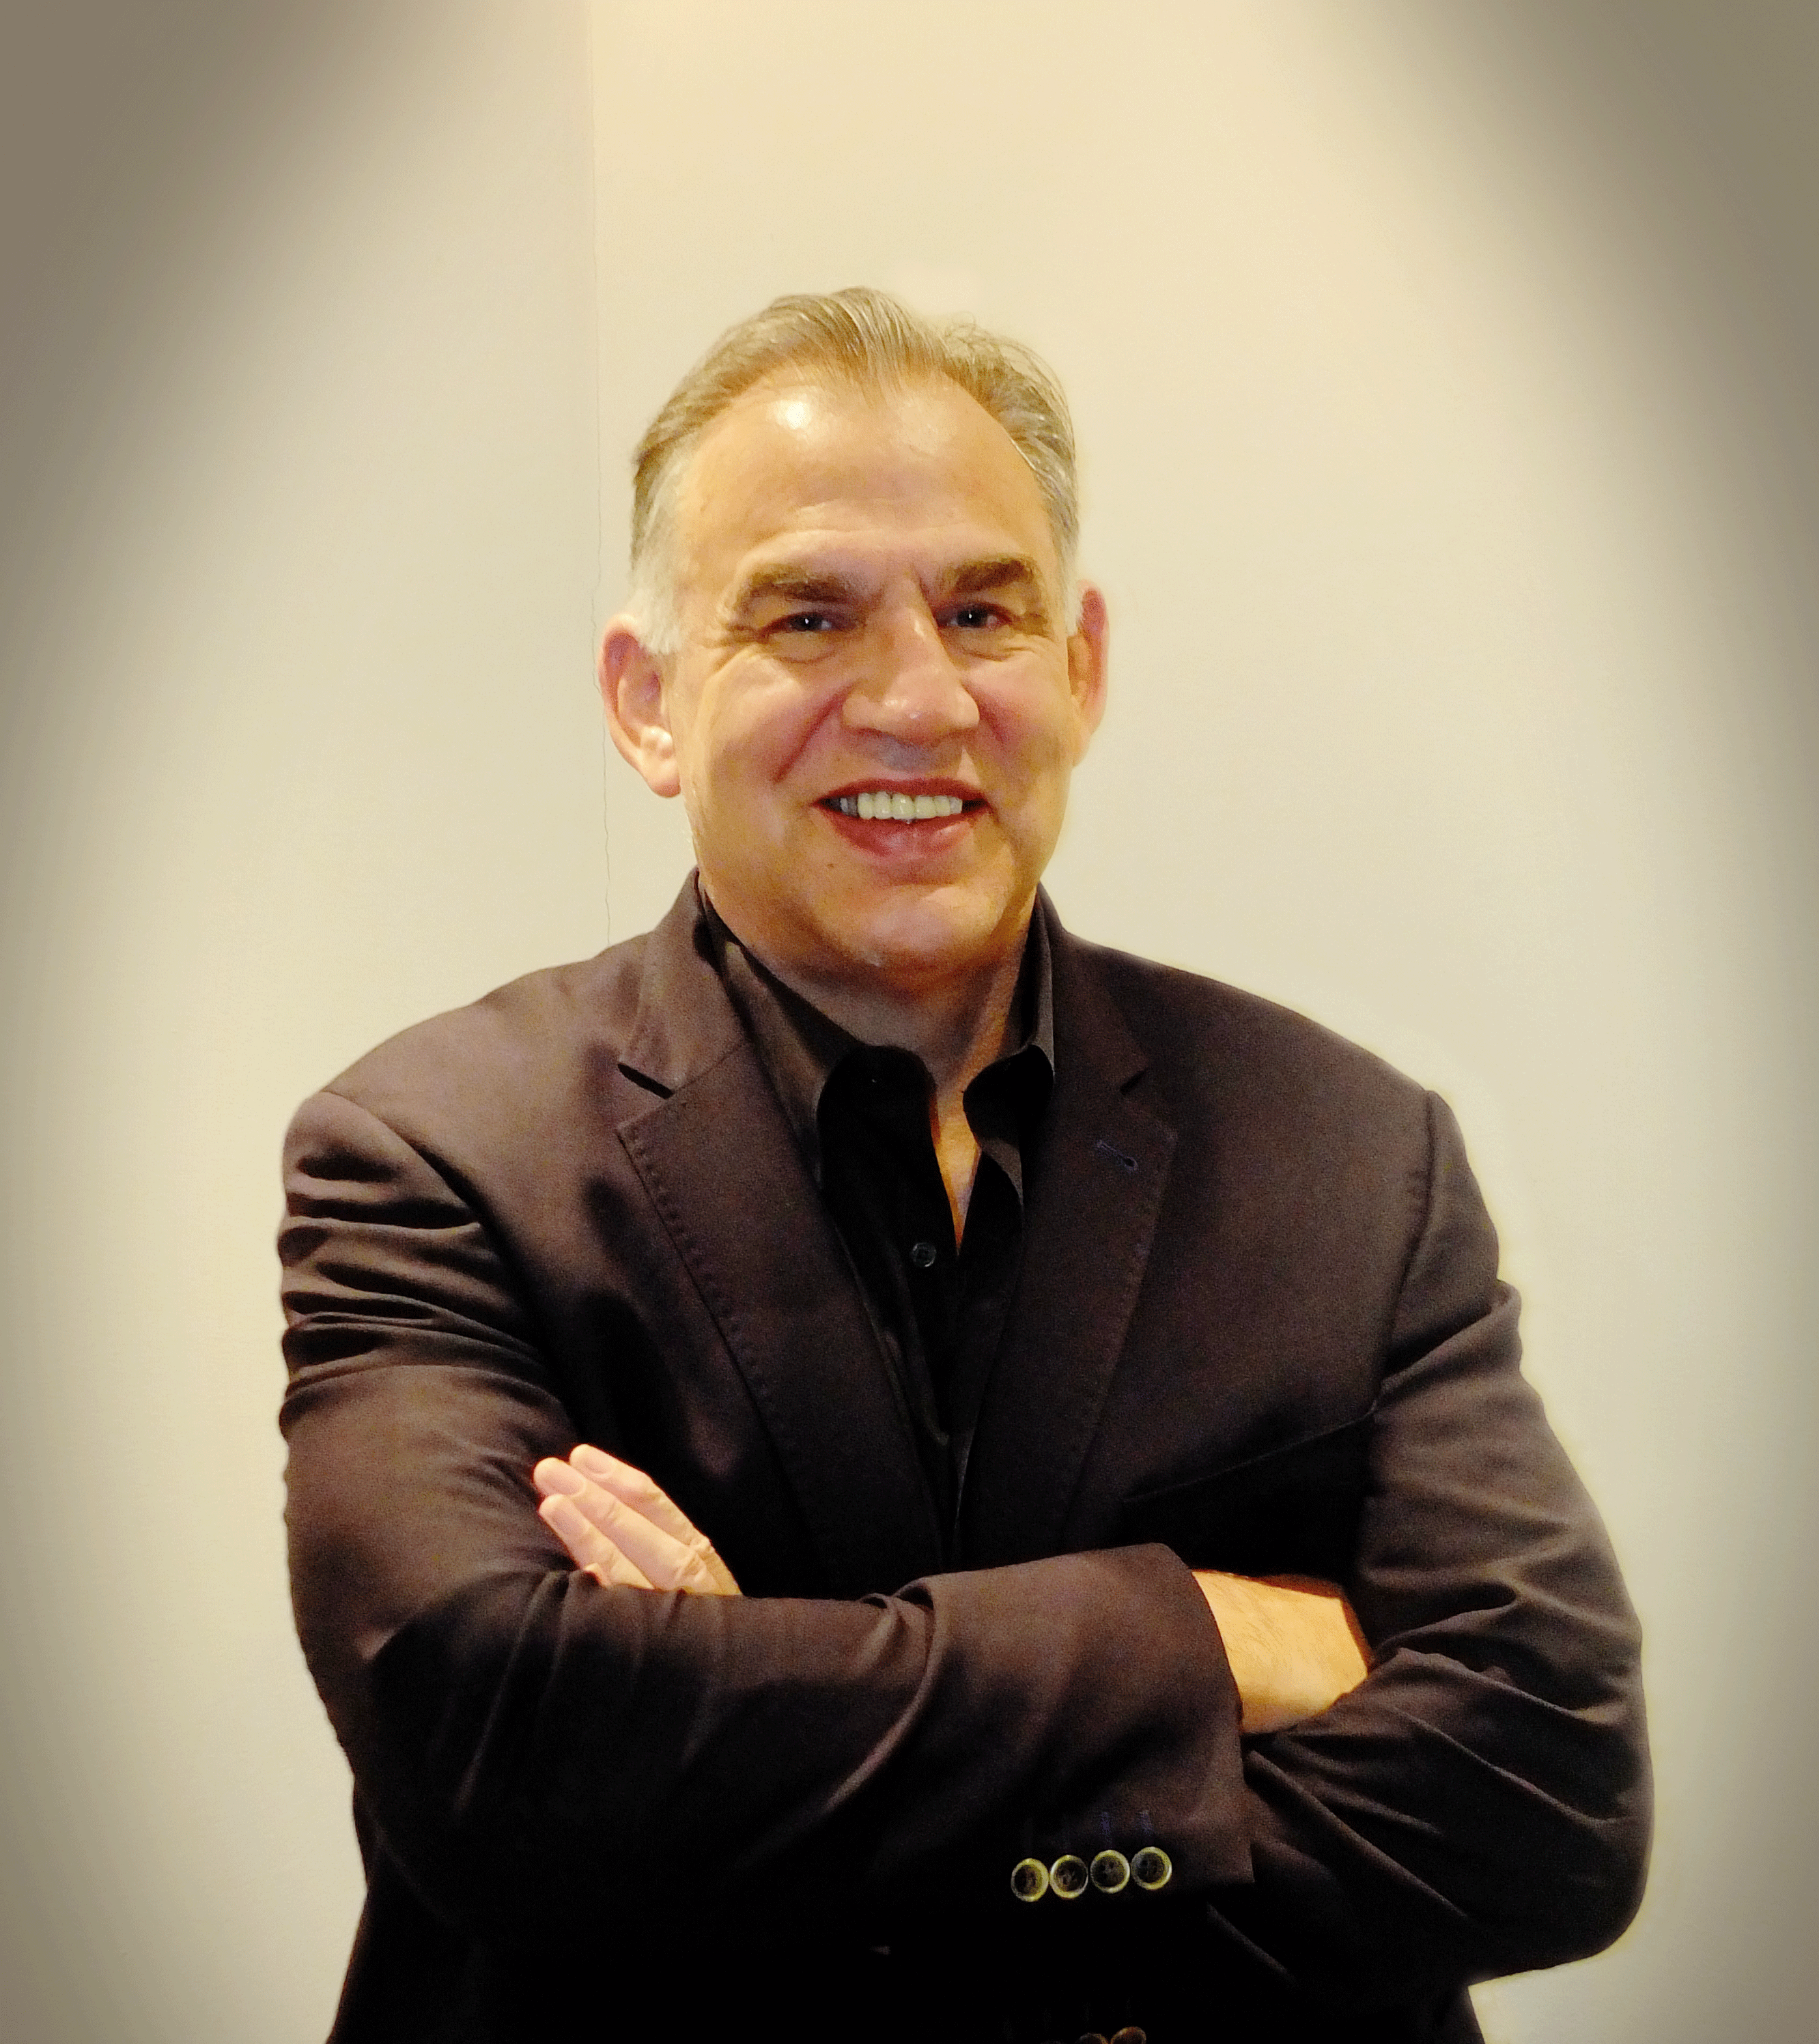 Sean Kelleher